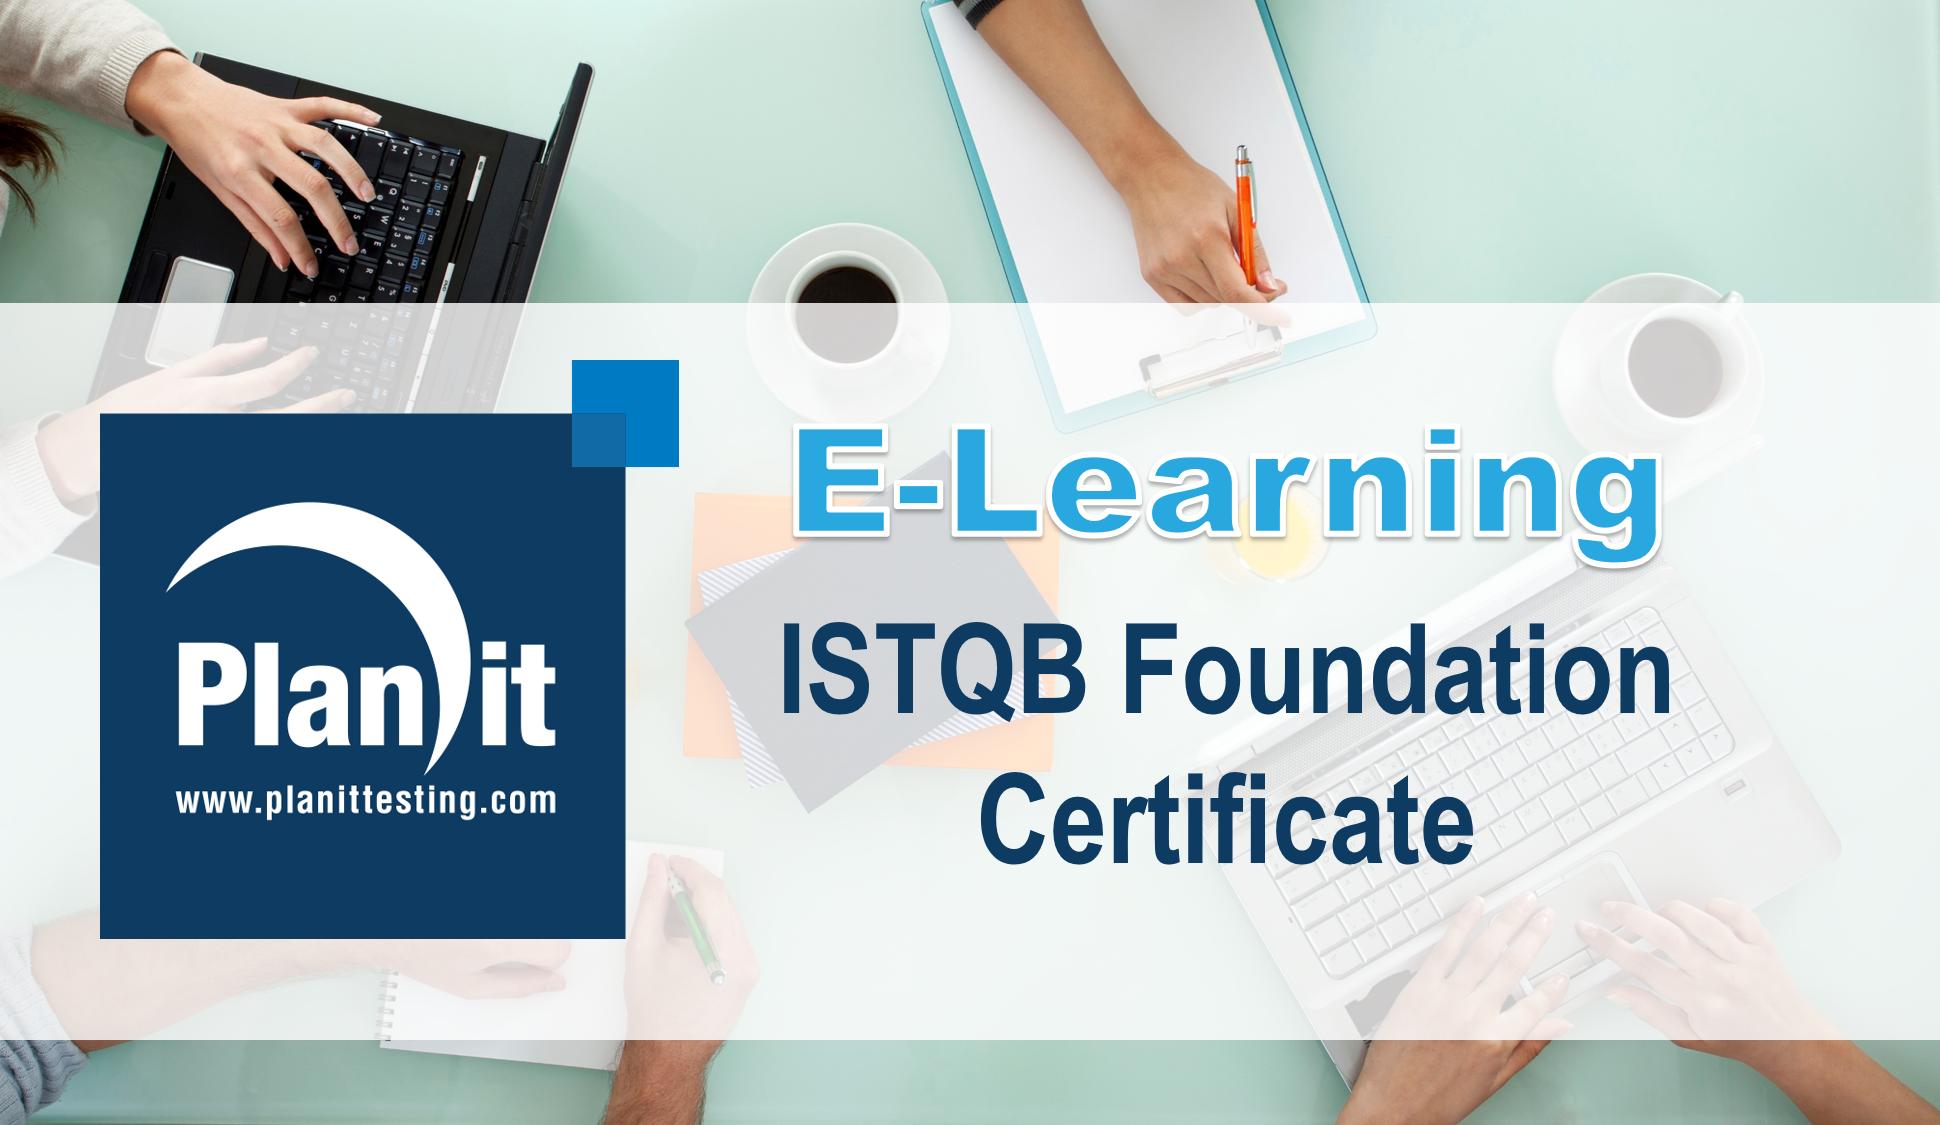 ISTQB Foundation Certificate - Module 5: Test Management